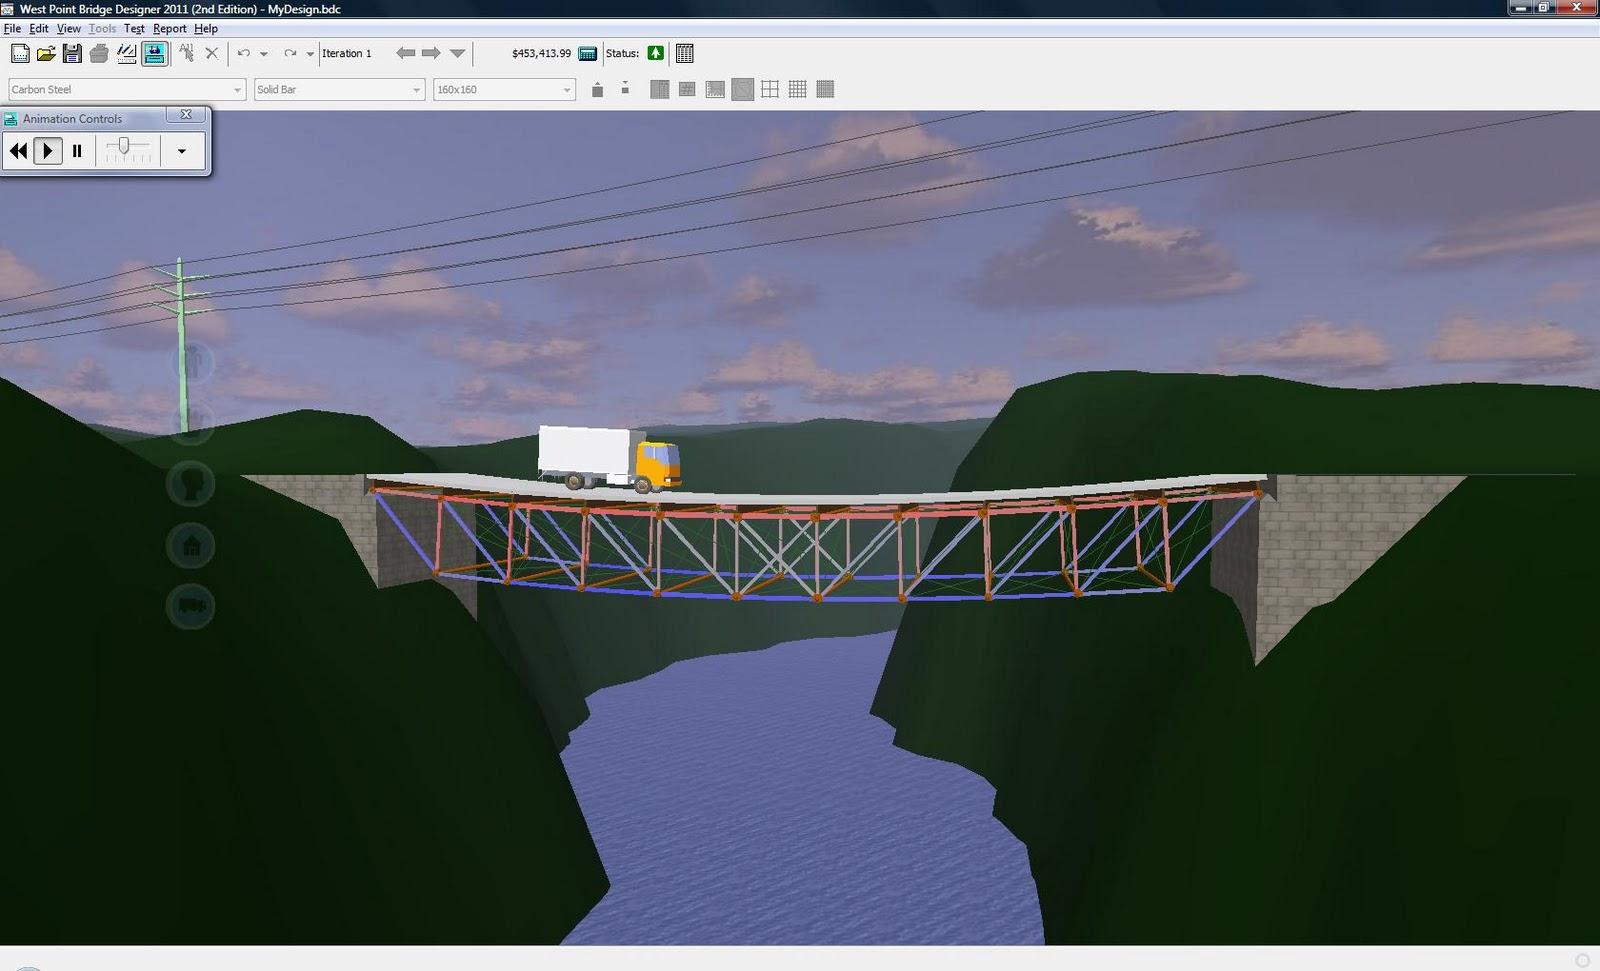 SimInsights: Simulation based design of bridges